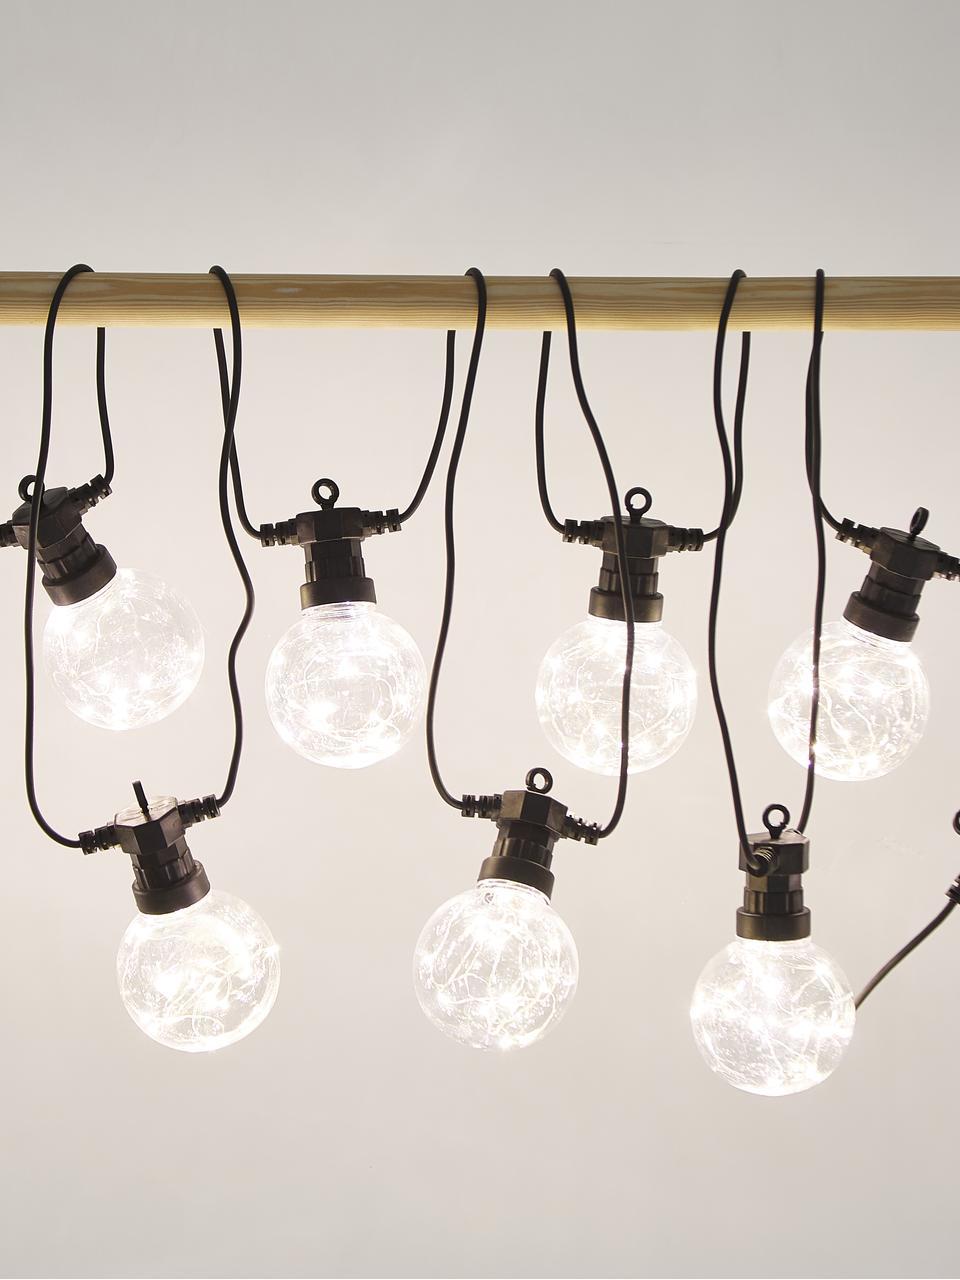 Girlanda świetlna LED Crackle Chain, 750 cm i 10 lampionów, Transparentny, D 750 cm